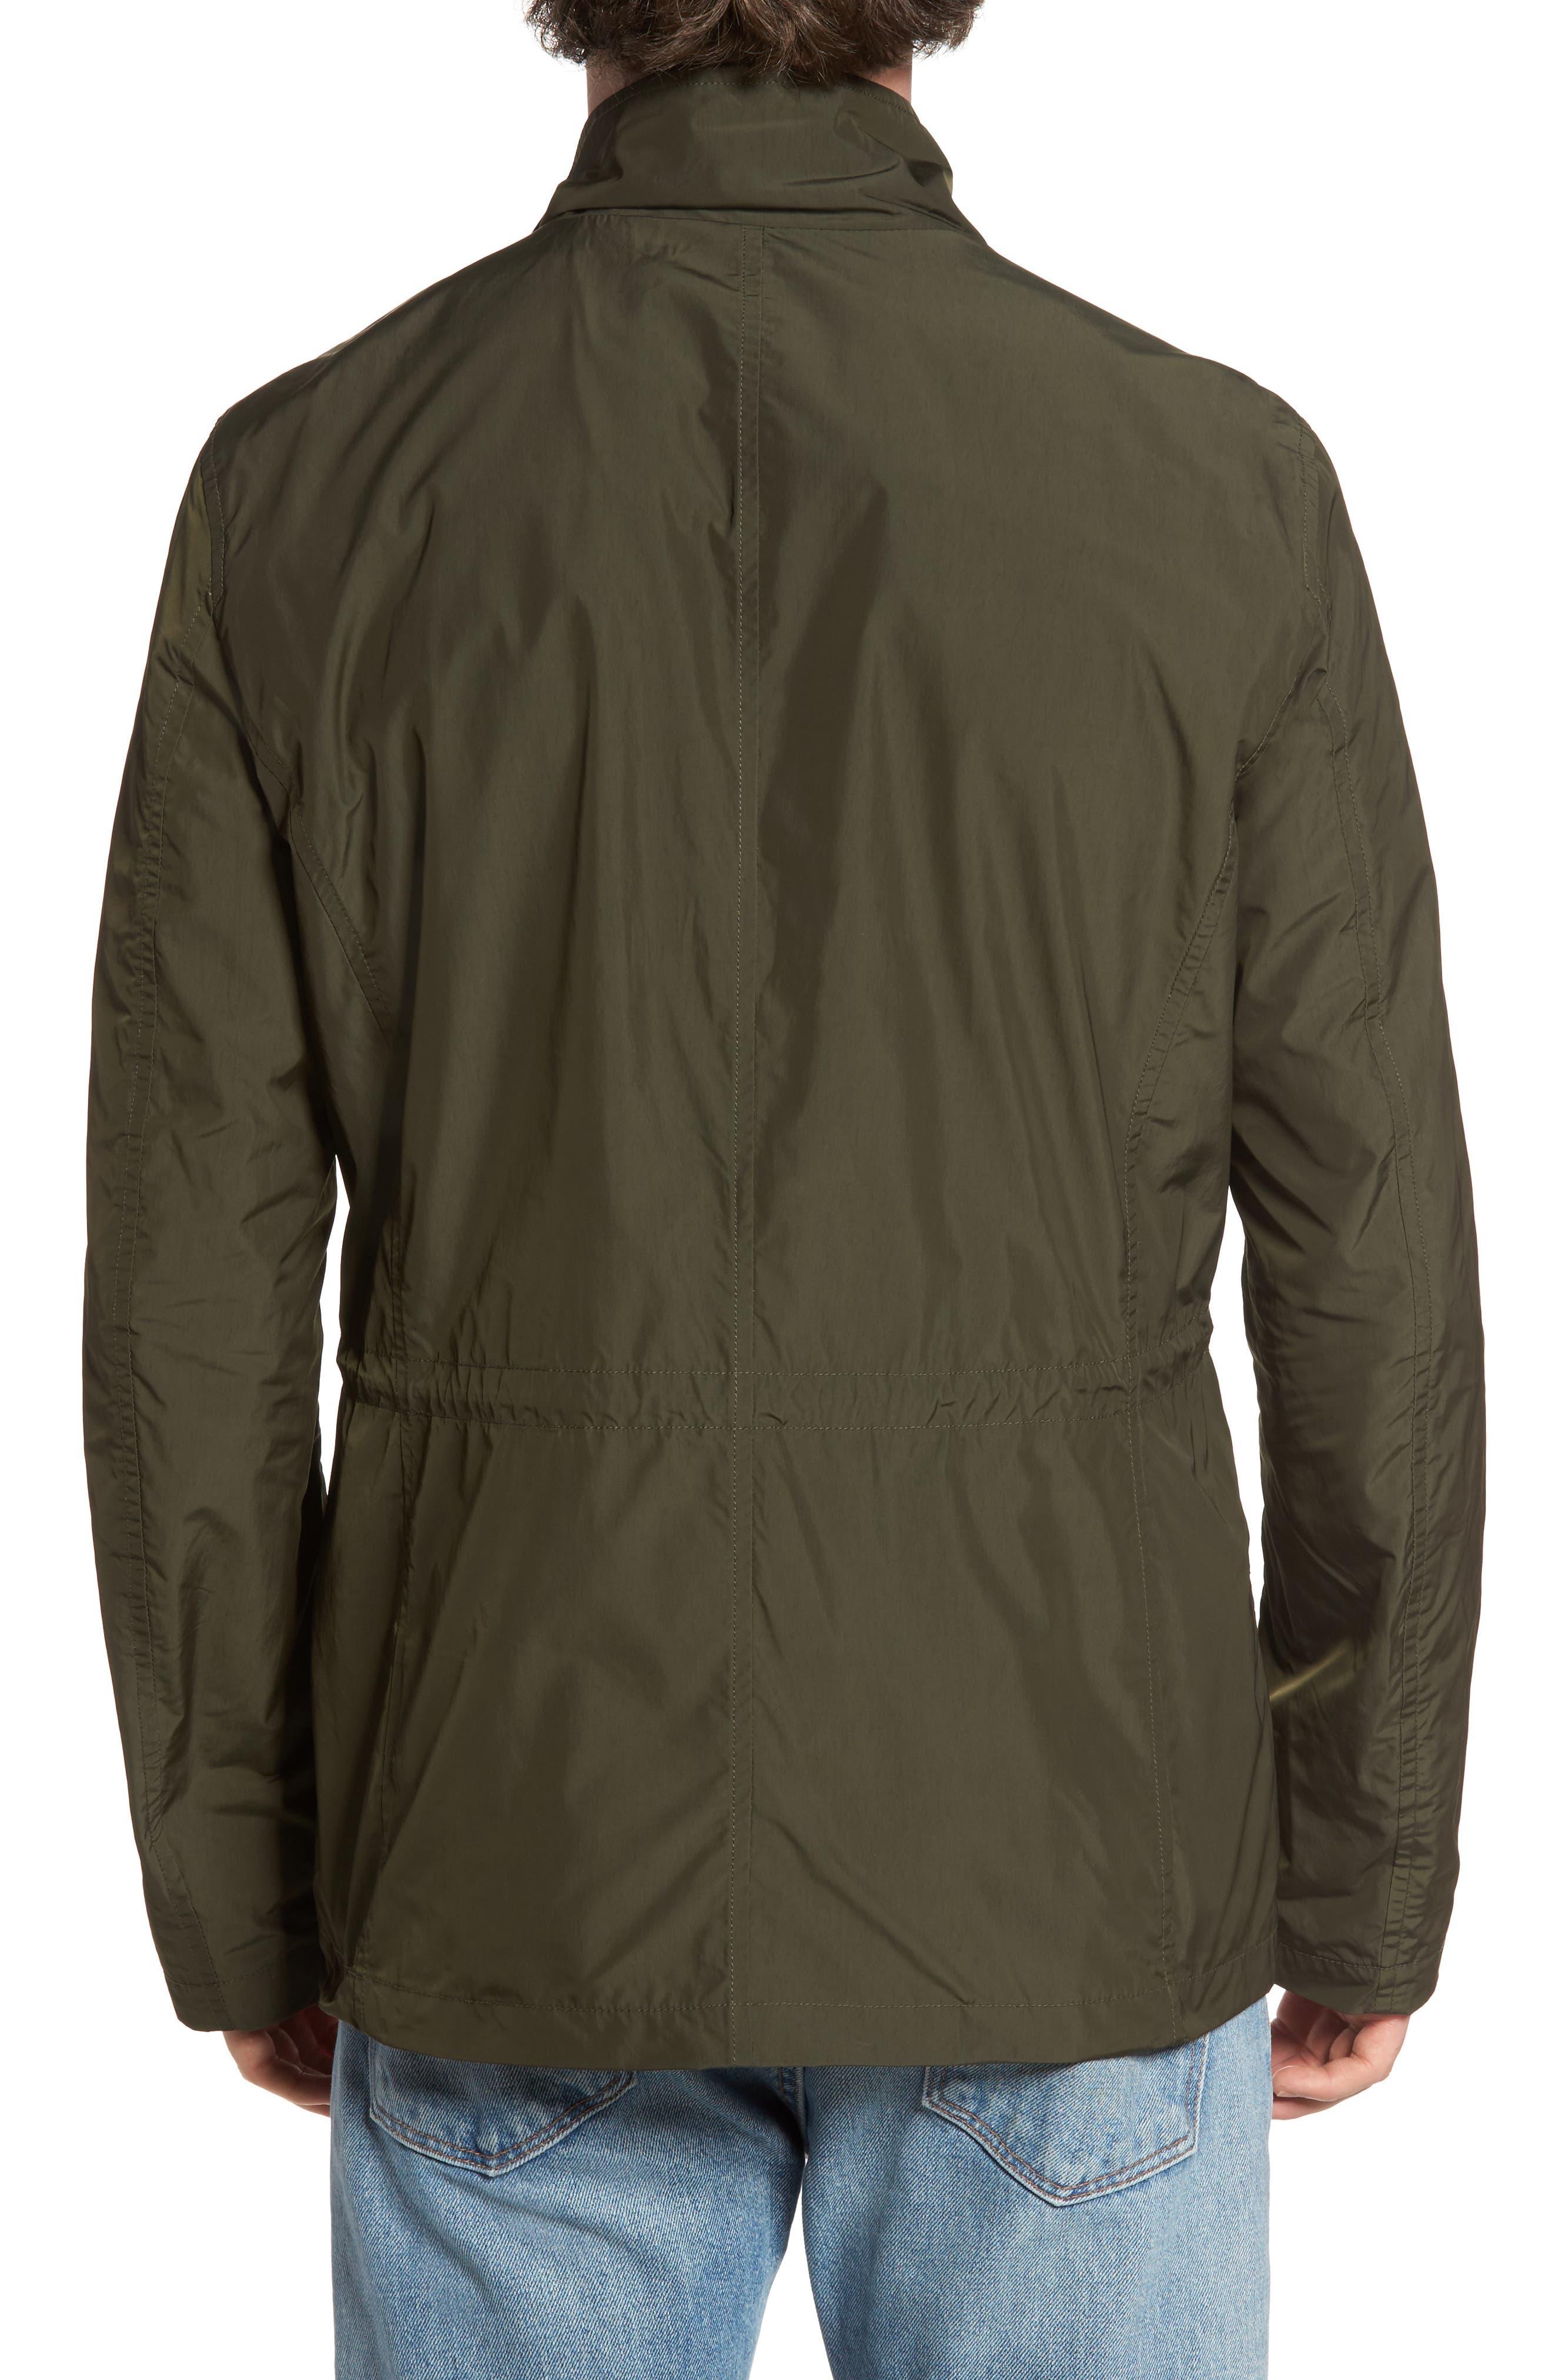 Woolrich John Rich Field Jacket,                             Alternate thumbnail 2, color,